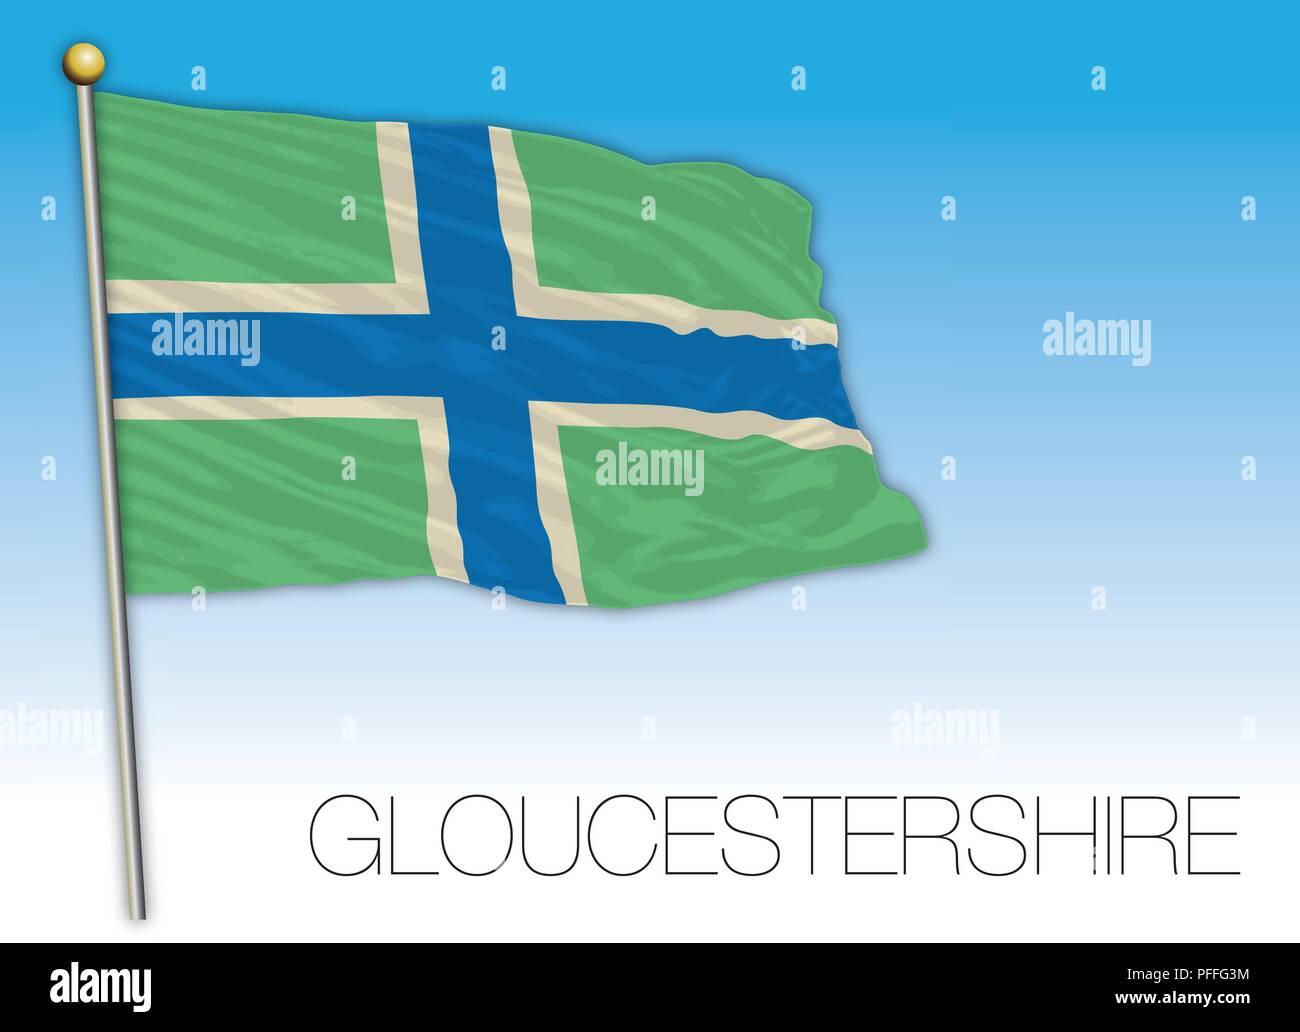 Gloucestershire flag, United Kingdom, vector illustration - Stock Vector